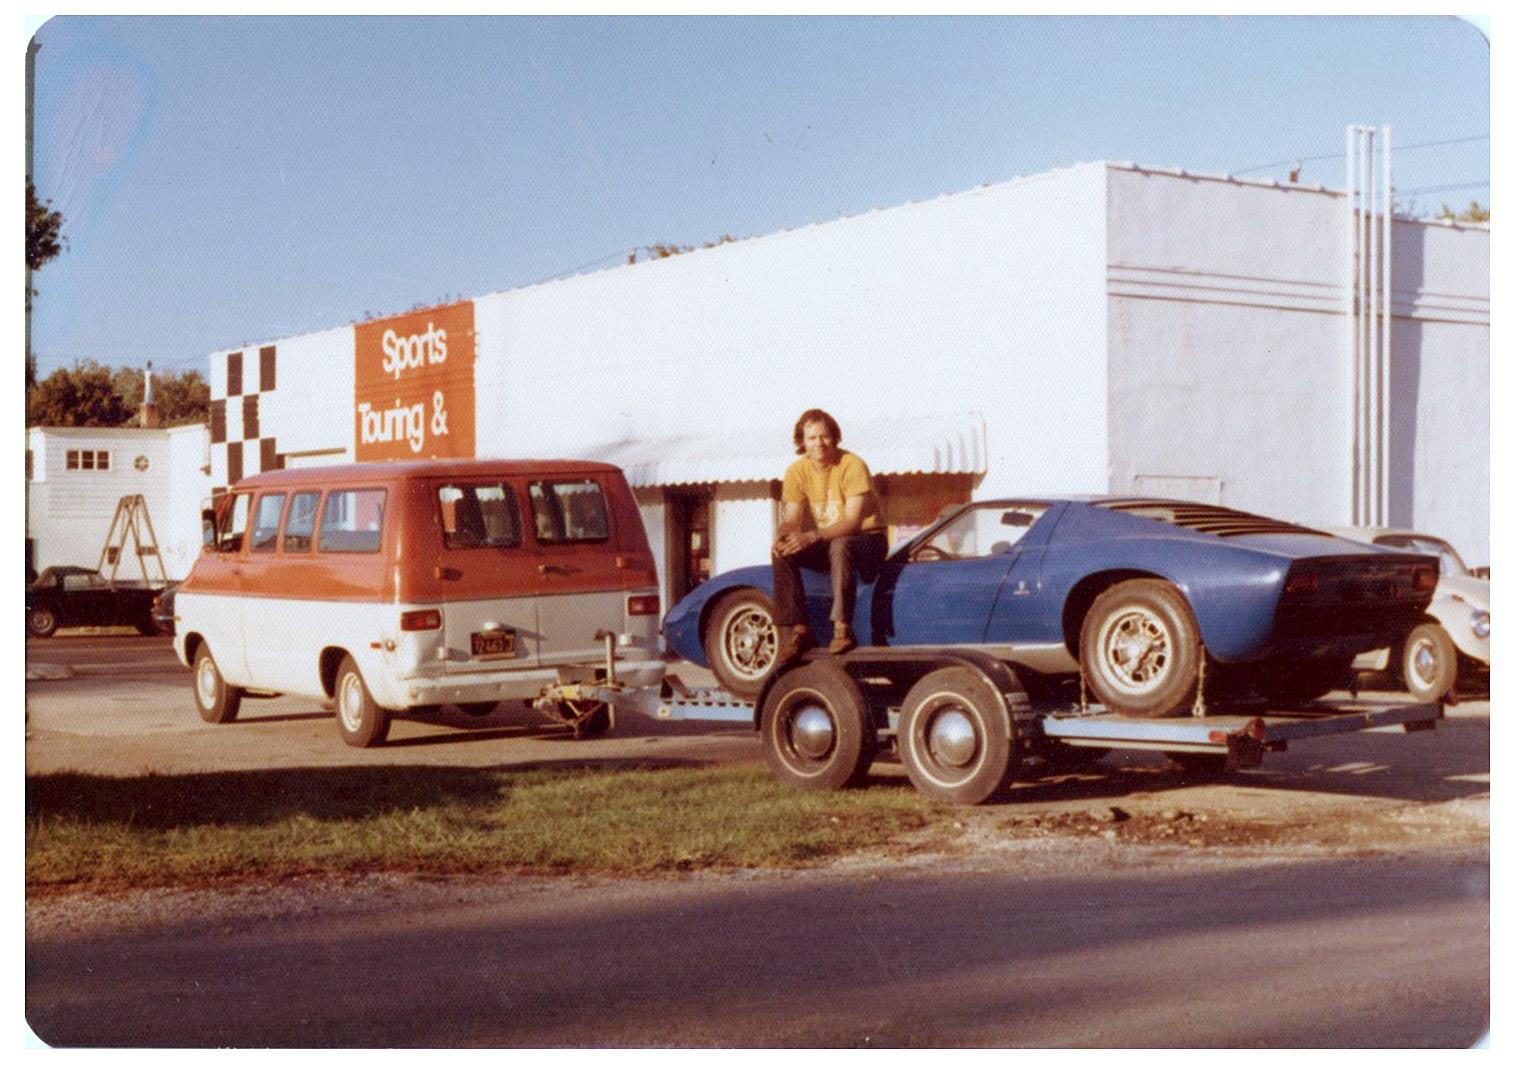 Eric Seltzer with his 1968 Miura